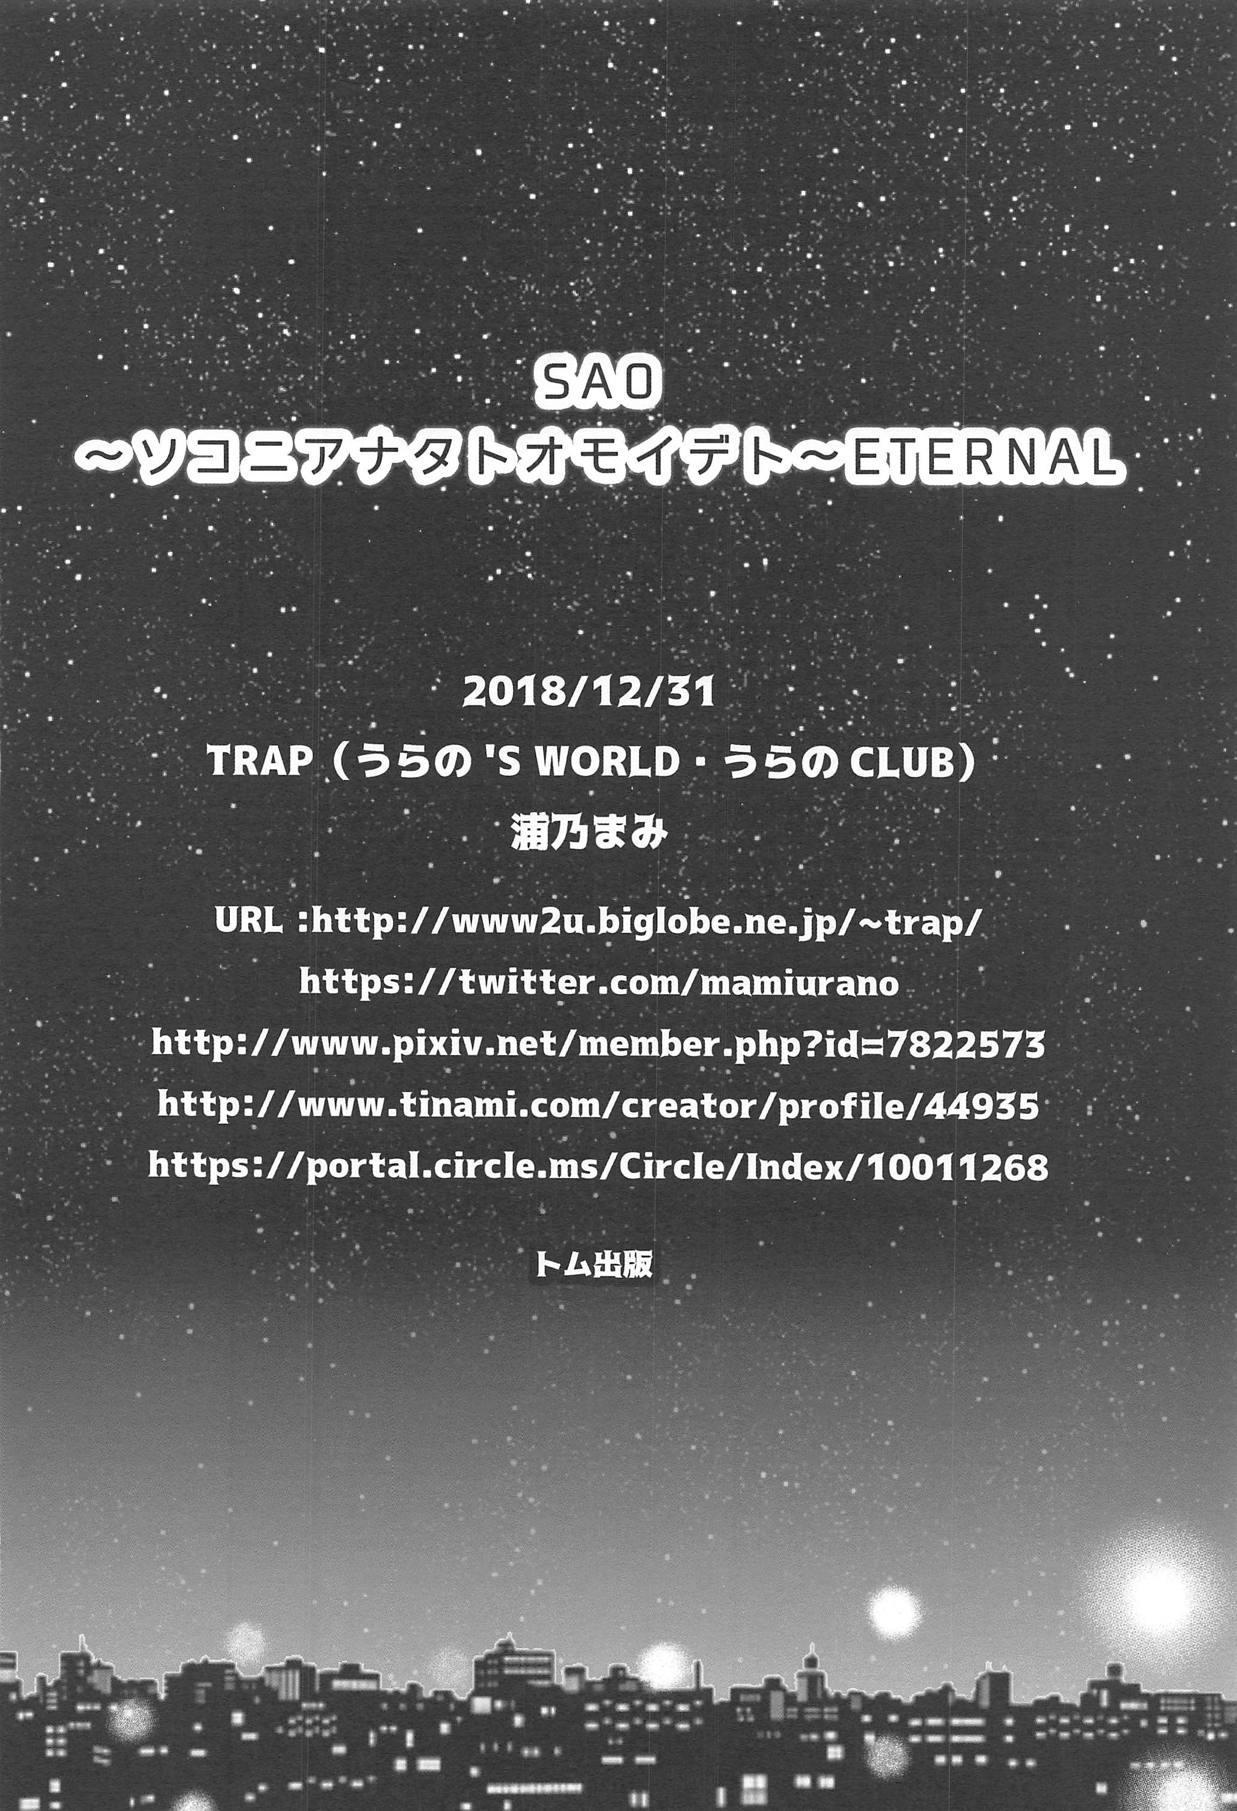 (C95) [TRAP (Urano Mami)] SAO ~sokoni anatato omoideto~ ETERNAL (Sword Art Online) 30